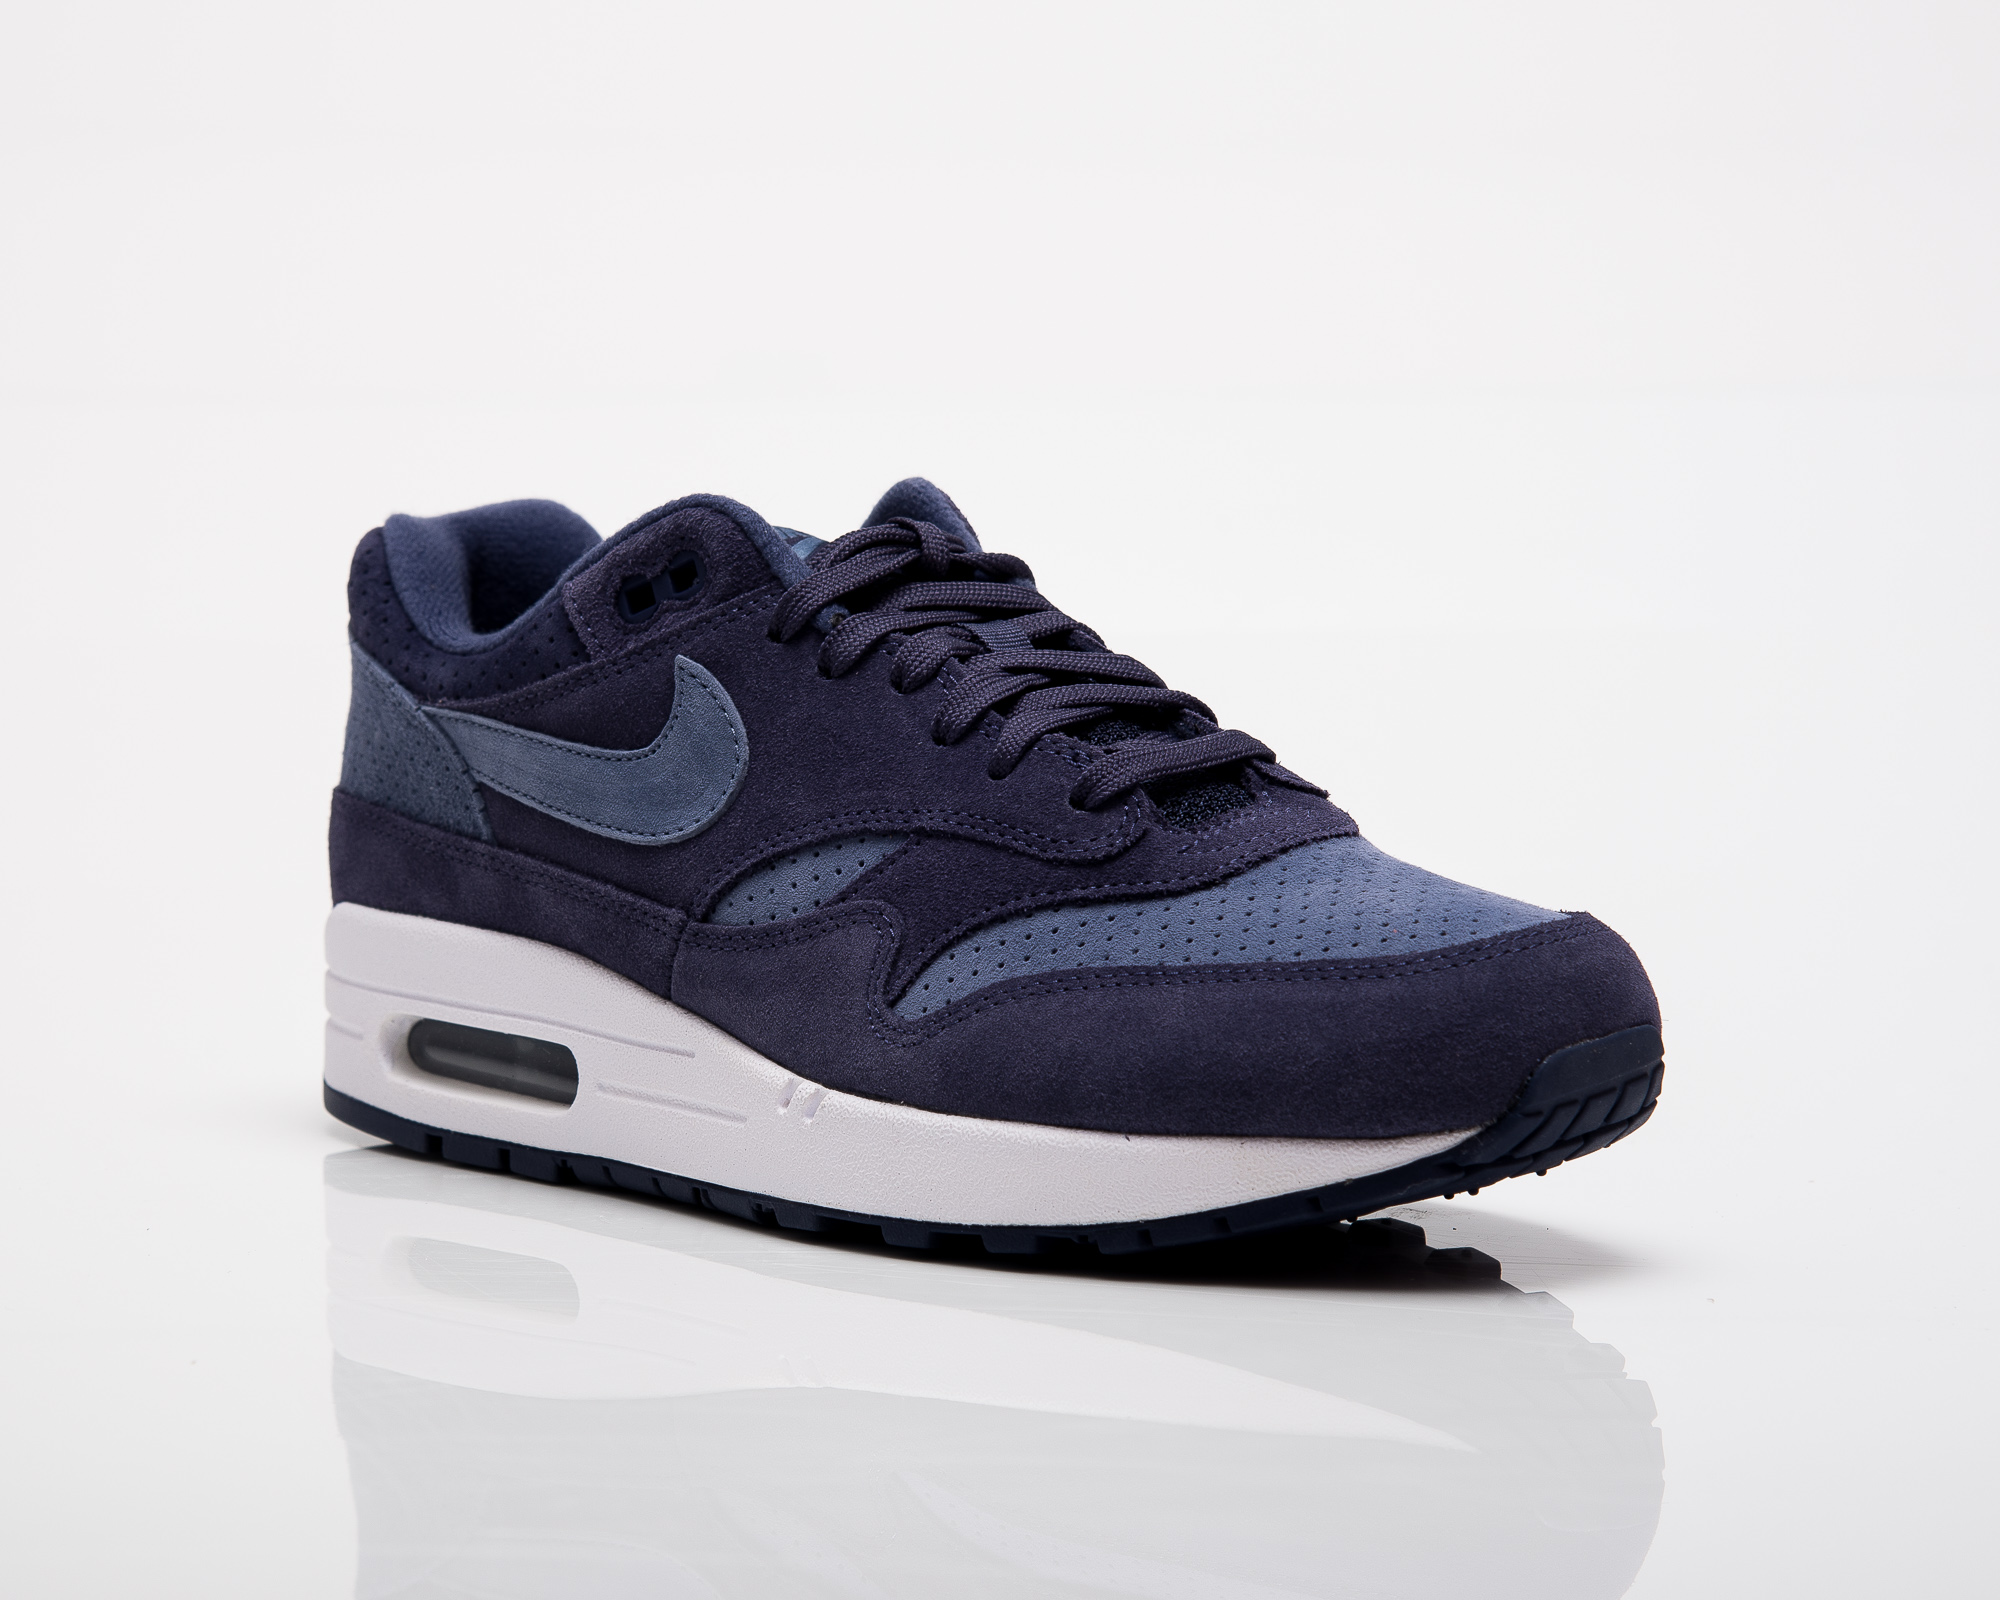 lowest price 06edf 4e5b0 Nike Air Max 1 Premium